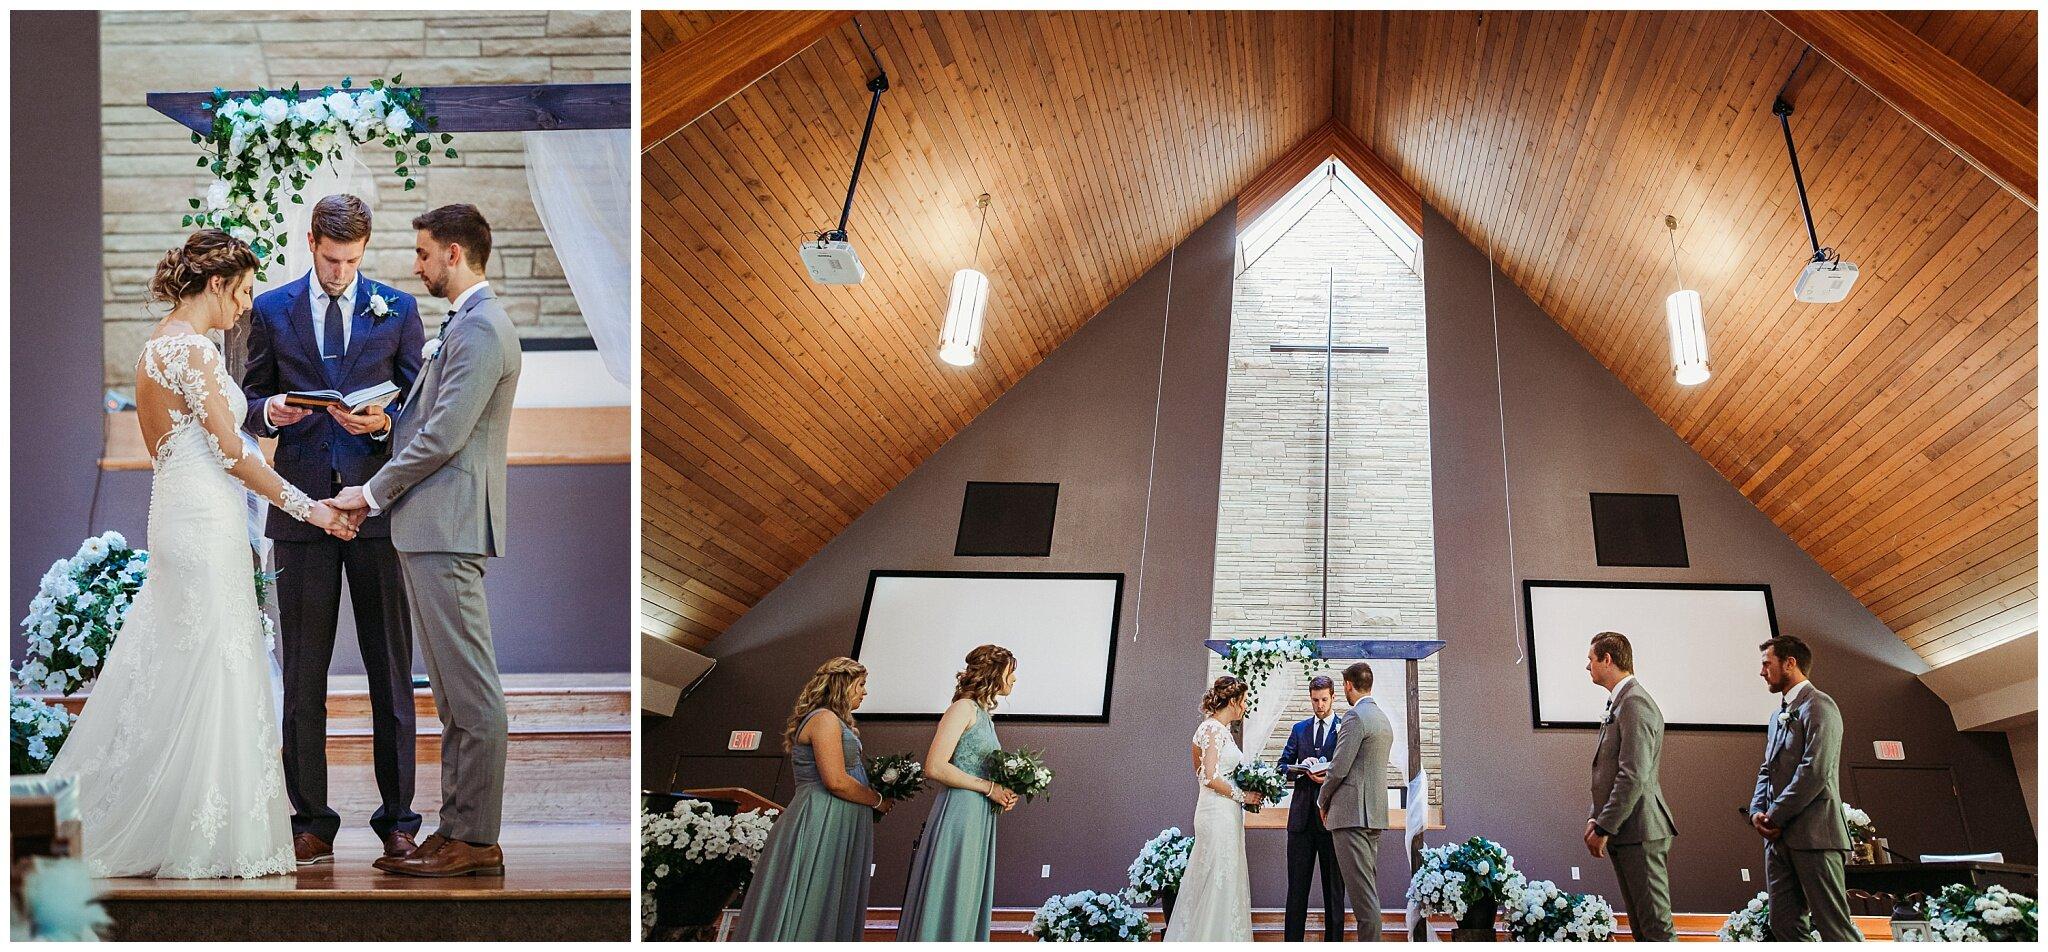 Eighteen Pastures Mission  BC Abbotsford BC Christian Wedding Photographer Summer Bride Groom Inspo_0010.jpg